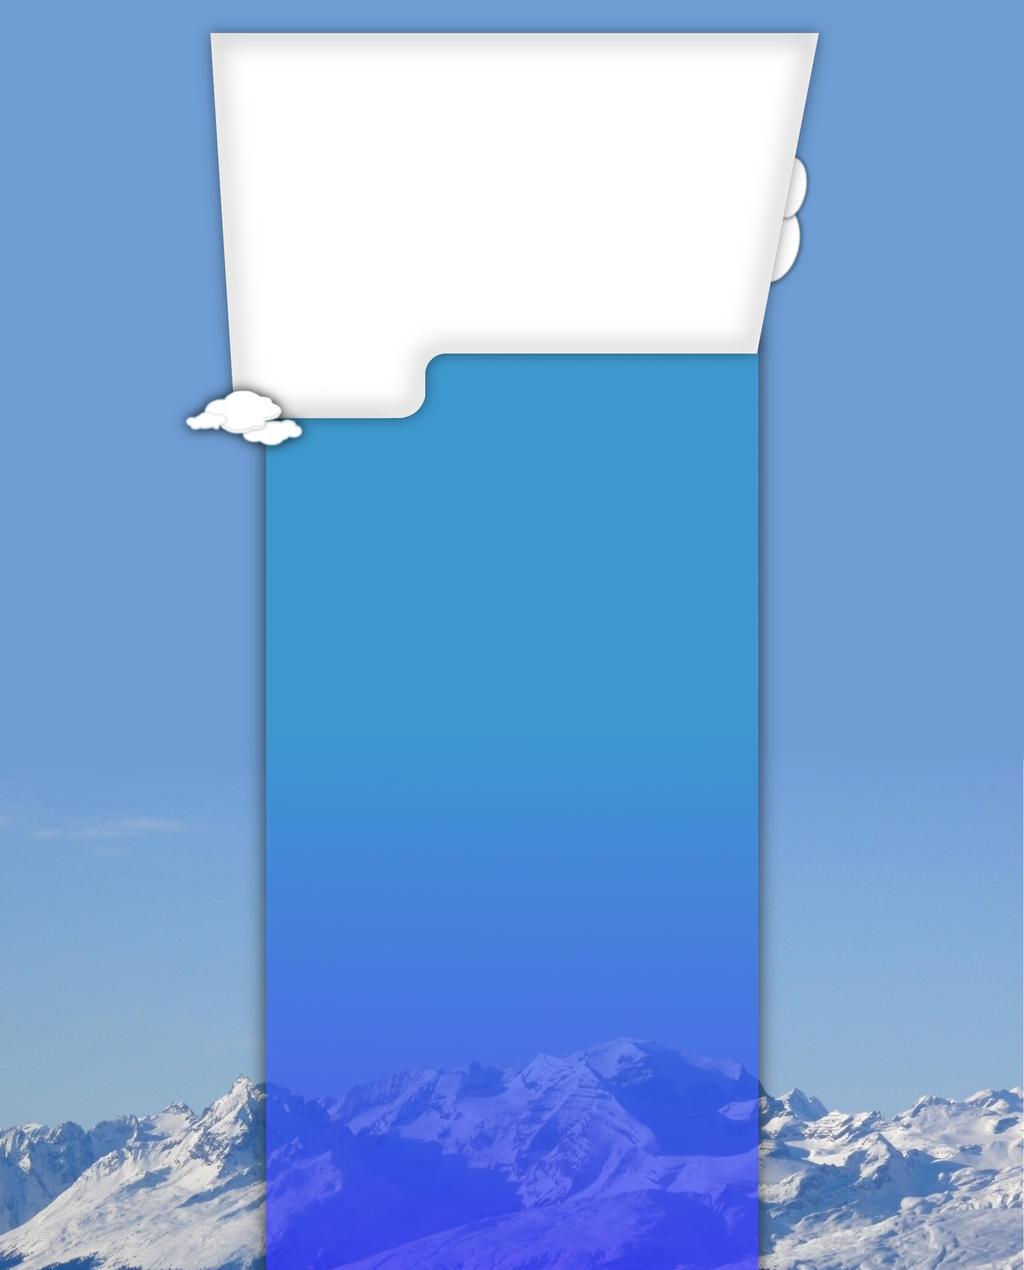 Cloudy Youtube Design by JonasForTheArt